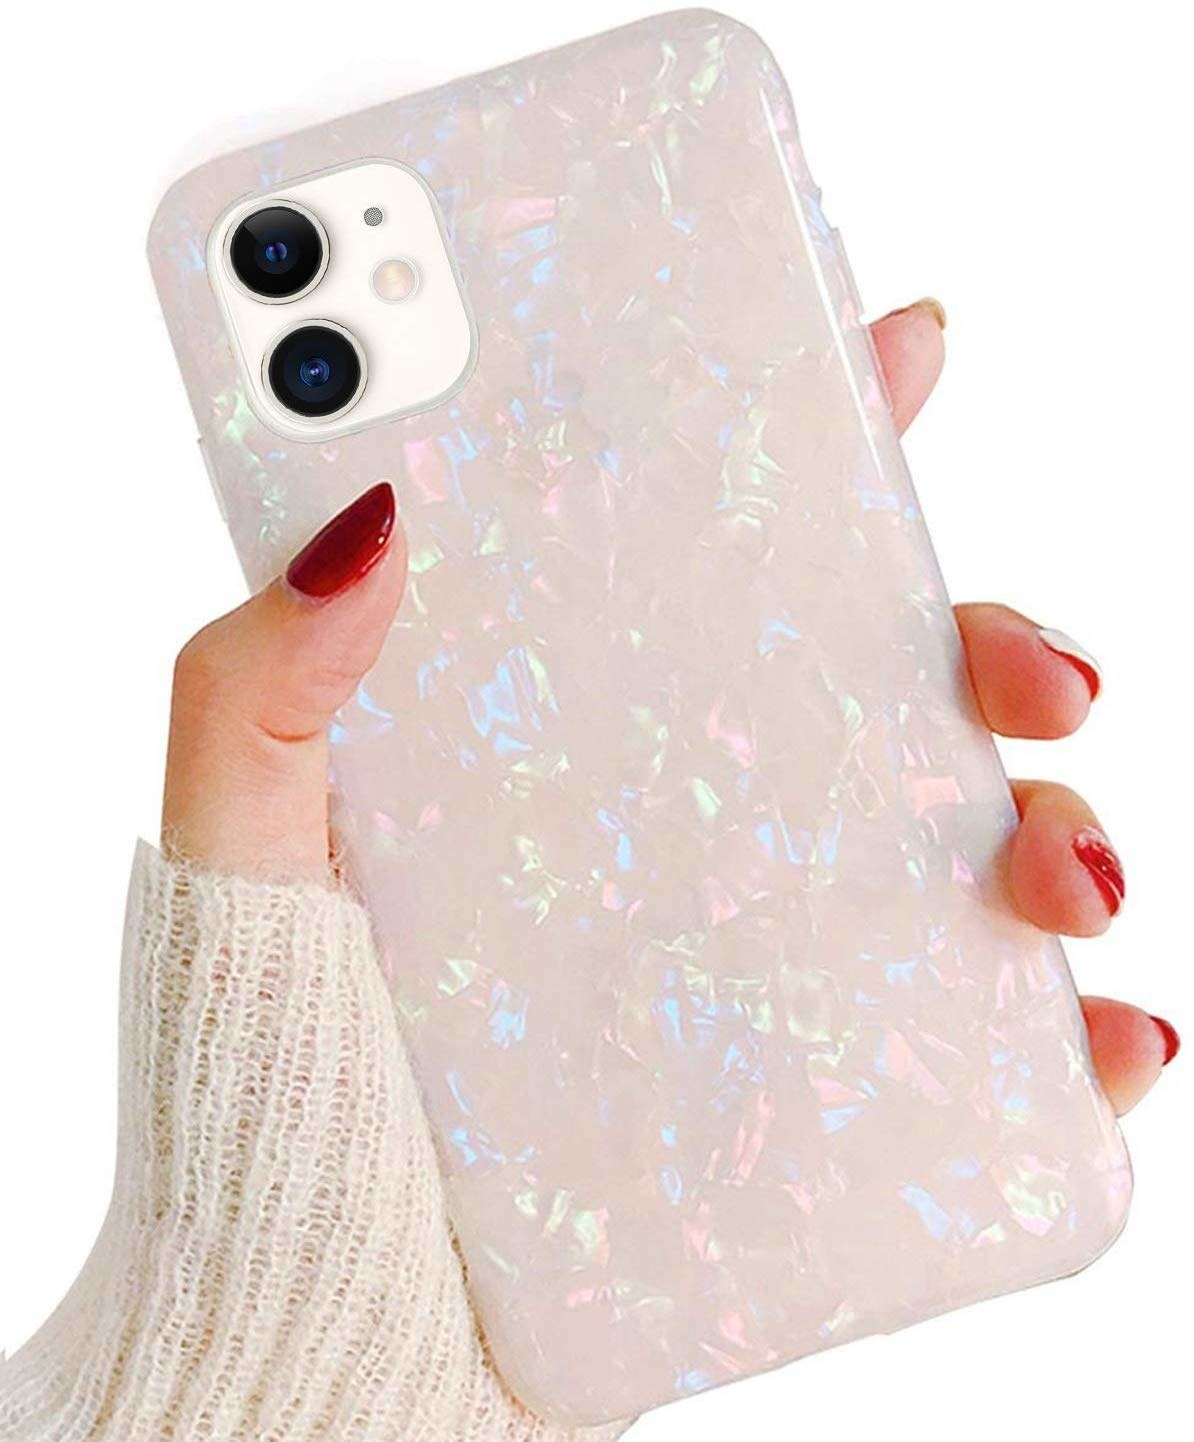 Sunlight Hamsters iphone 11 case